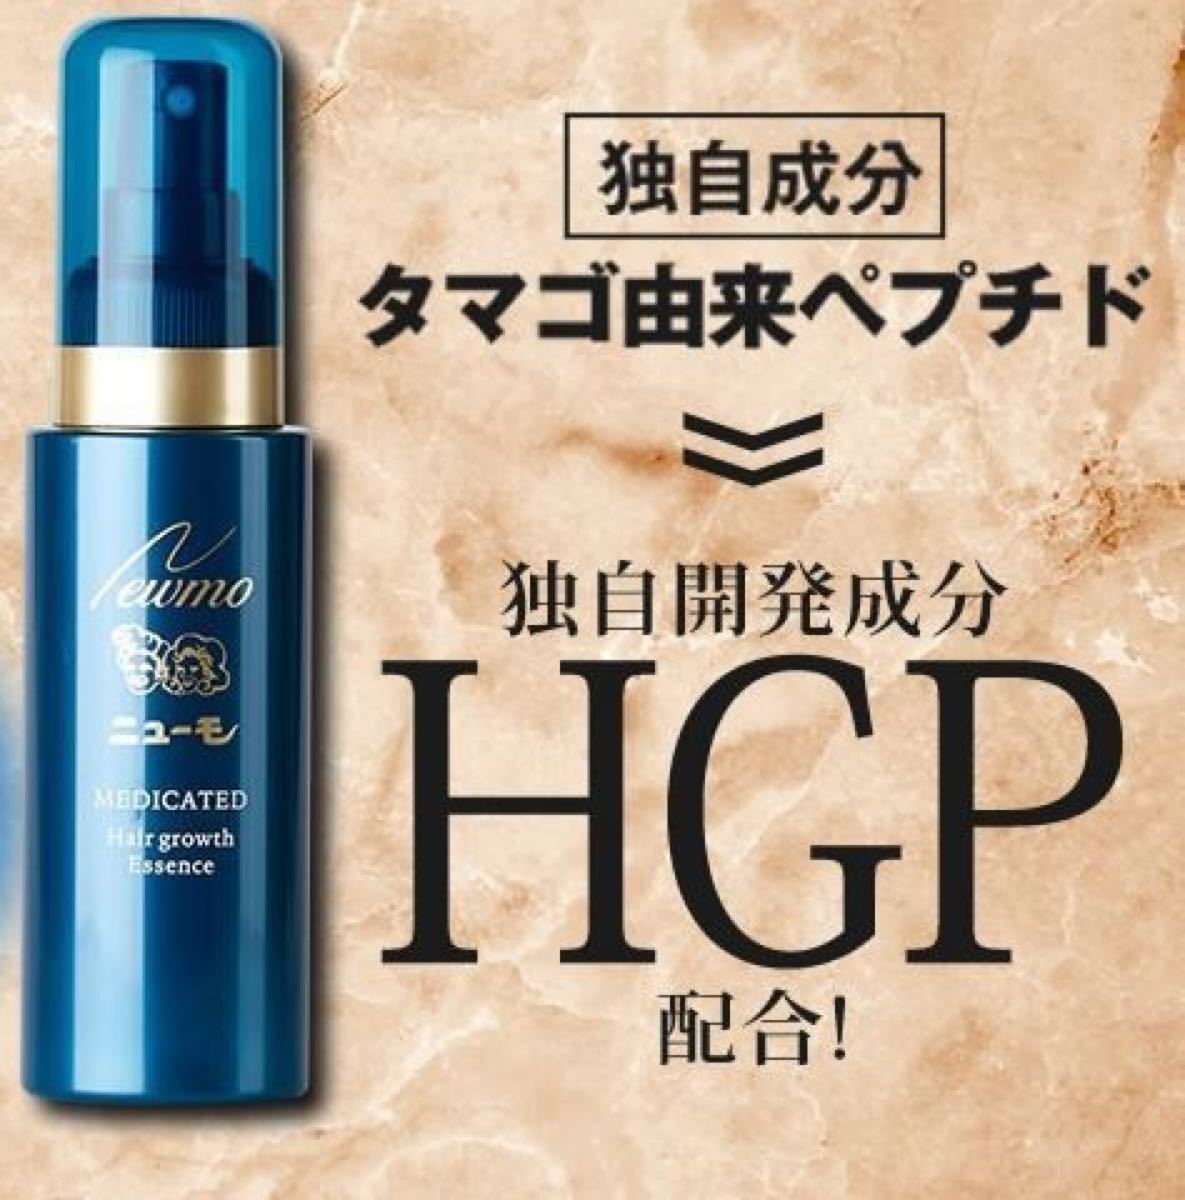 期間限定値下げ【未開封・新品】薬用育毛剤 ニューモ